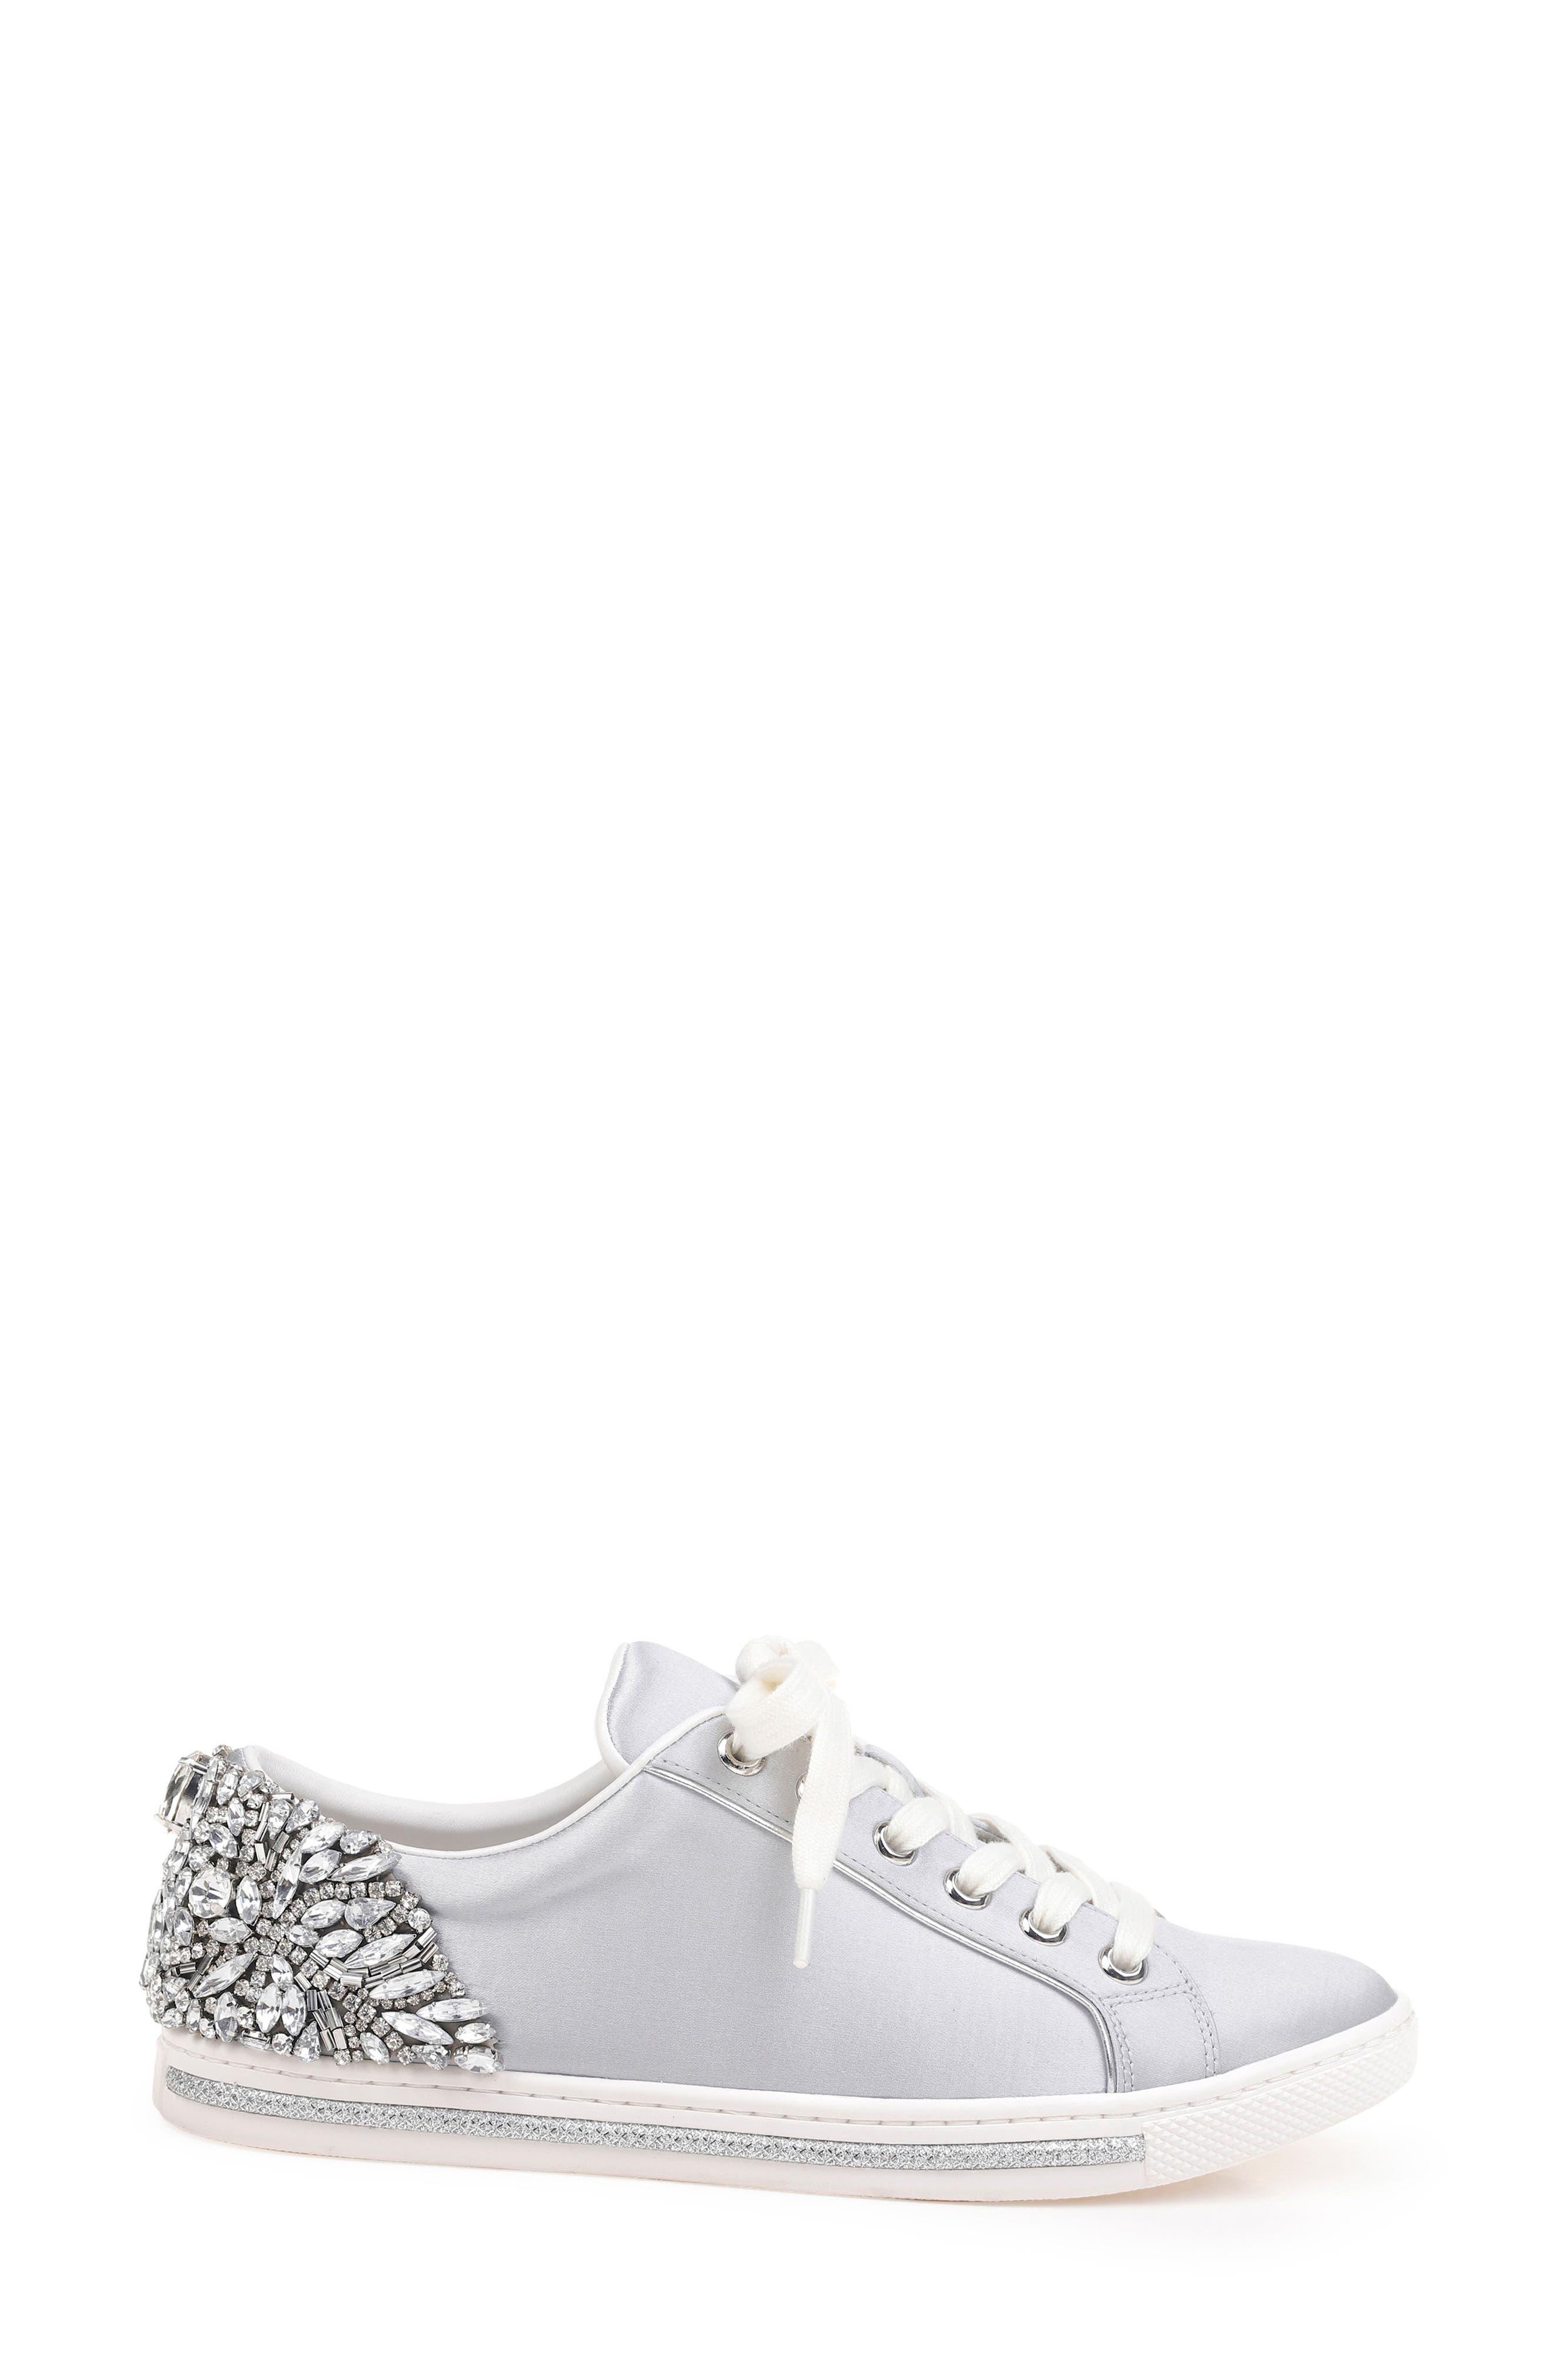 Badgley Mischka Shirley Crystal Embellished Sneaker,                             Alternate thumbnail 3, color,                             045